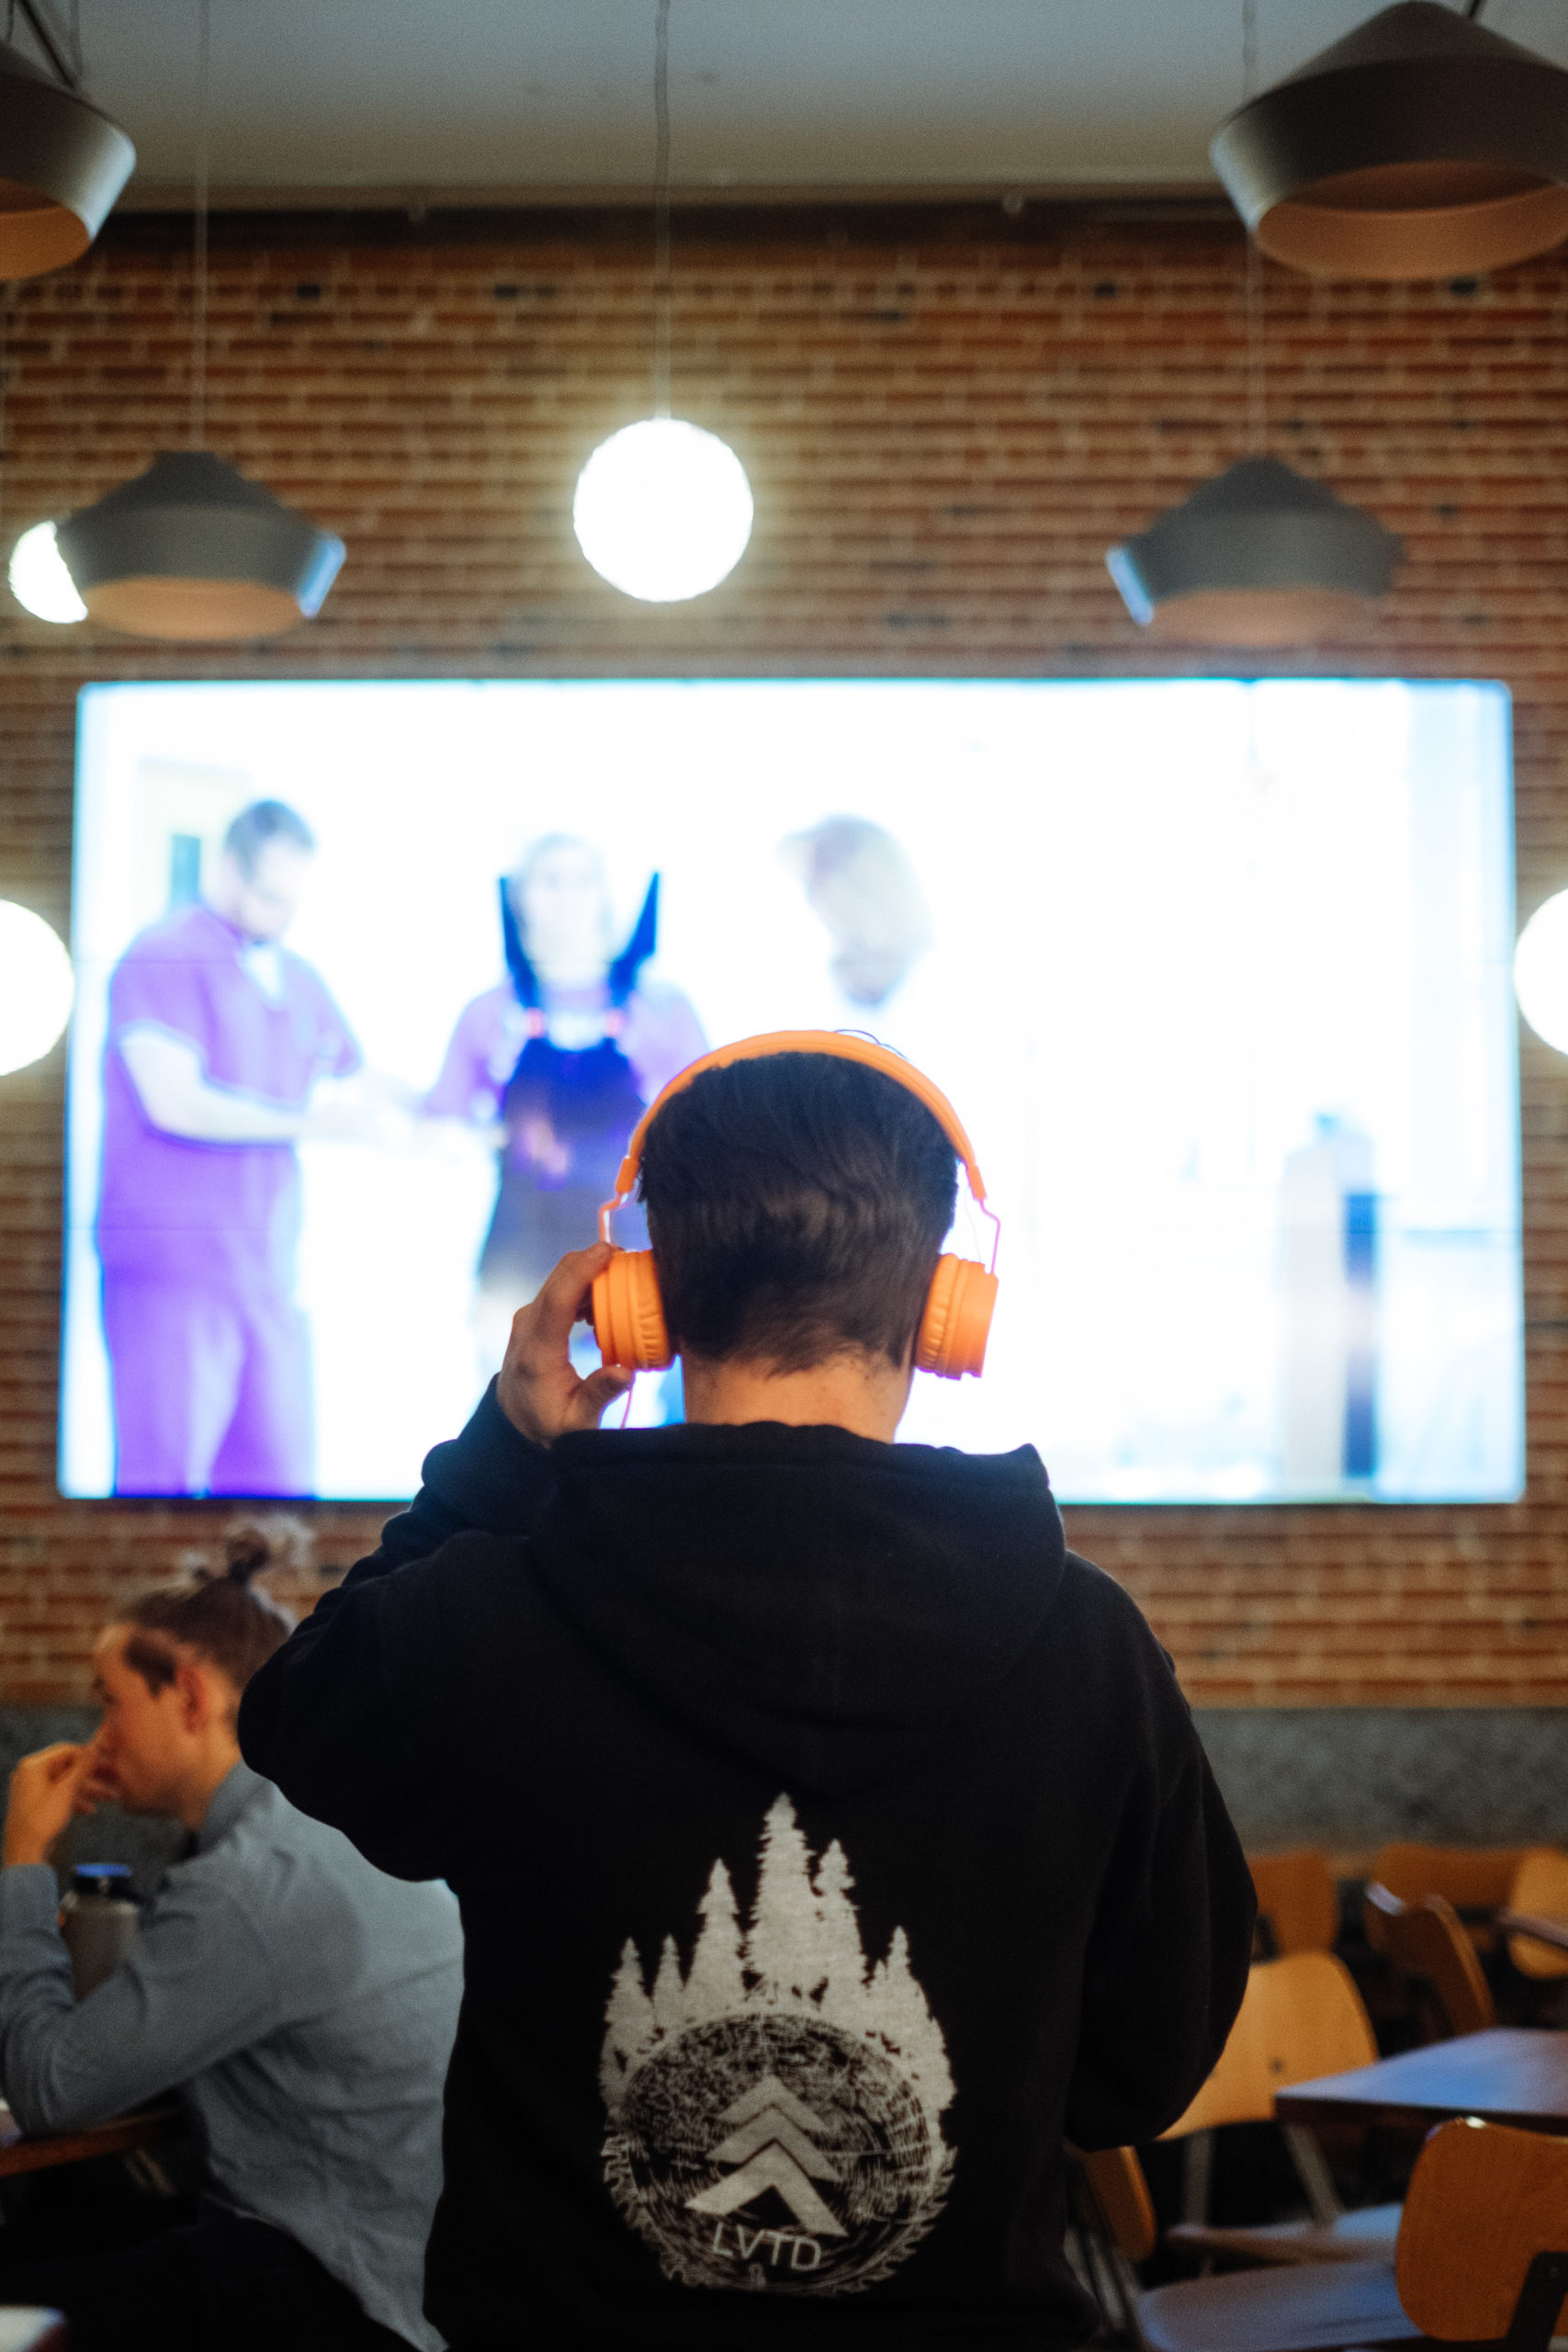 Man with Headphones Watching Screen